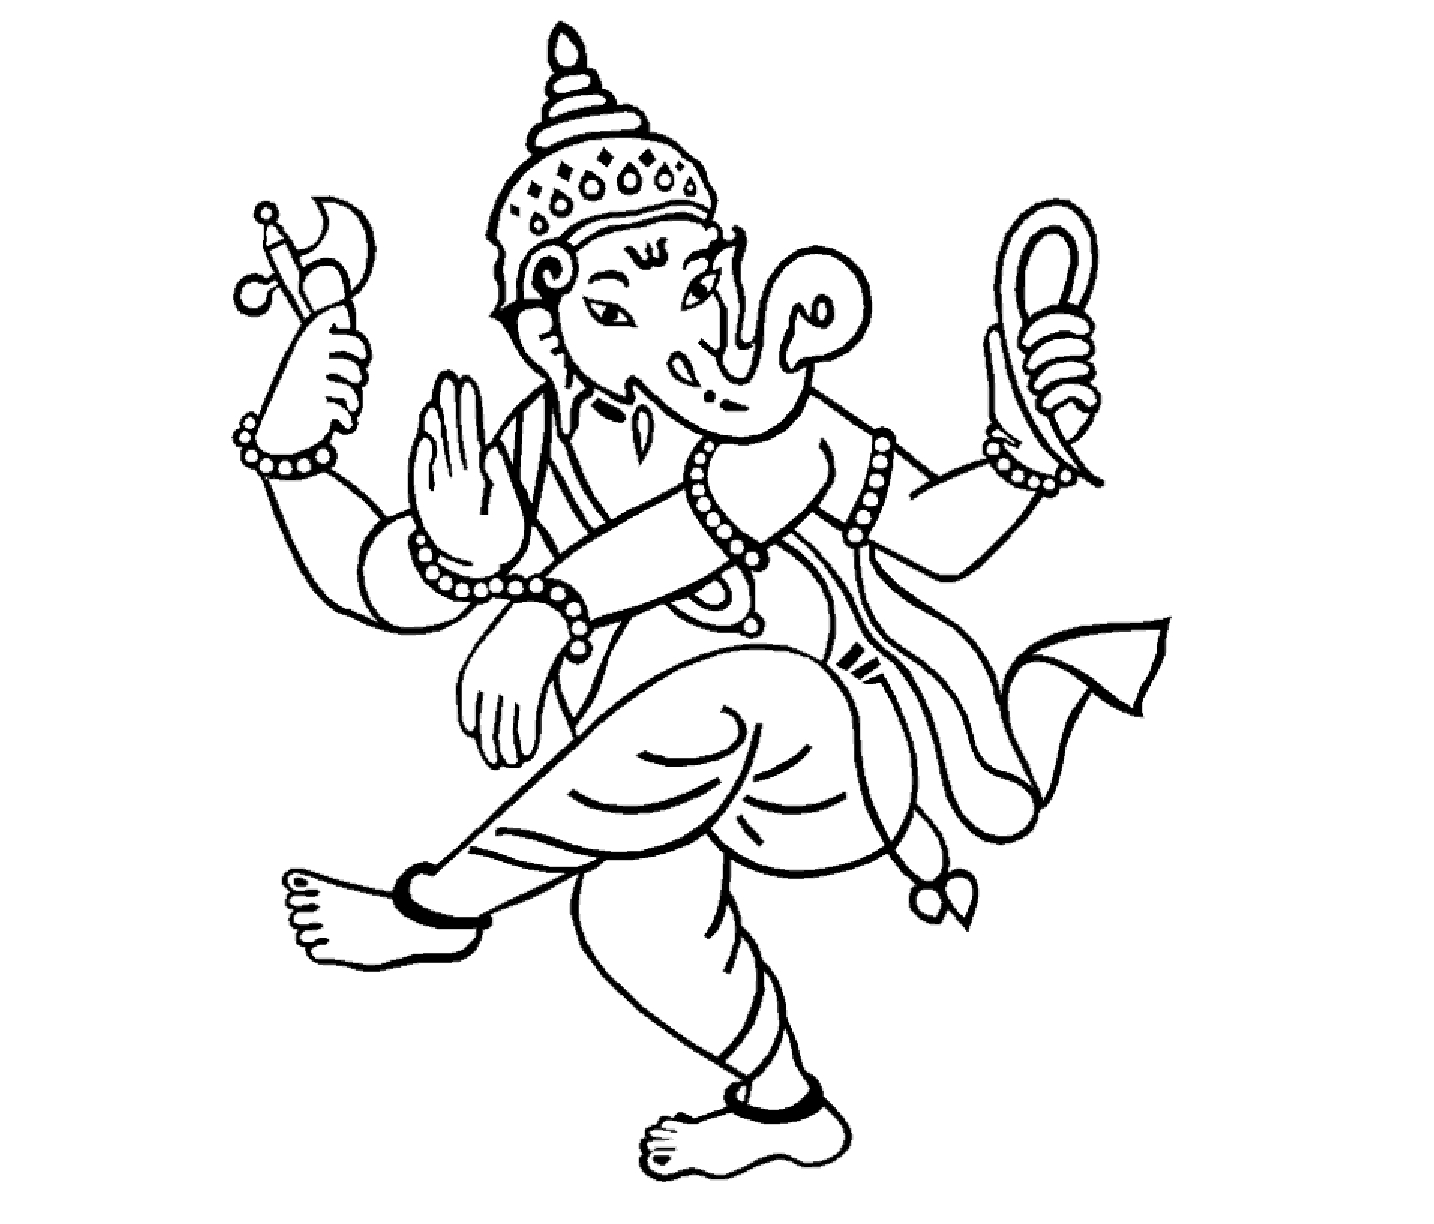 1434x1224 Drawing Of Lord Ganesha Hd Simple Drawing Of Lord Ganesha